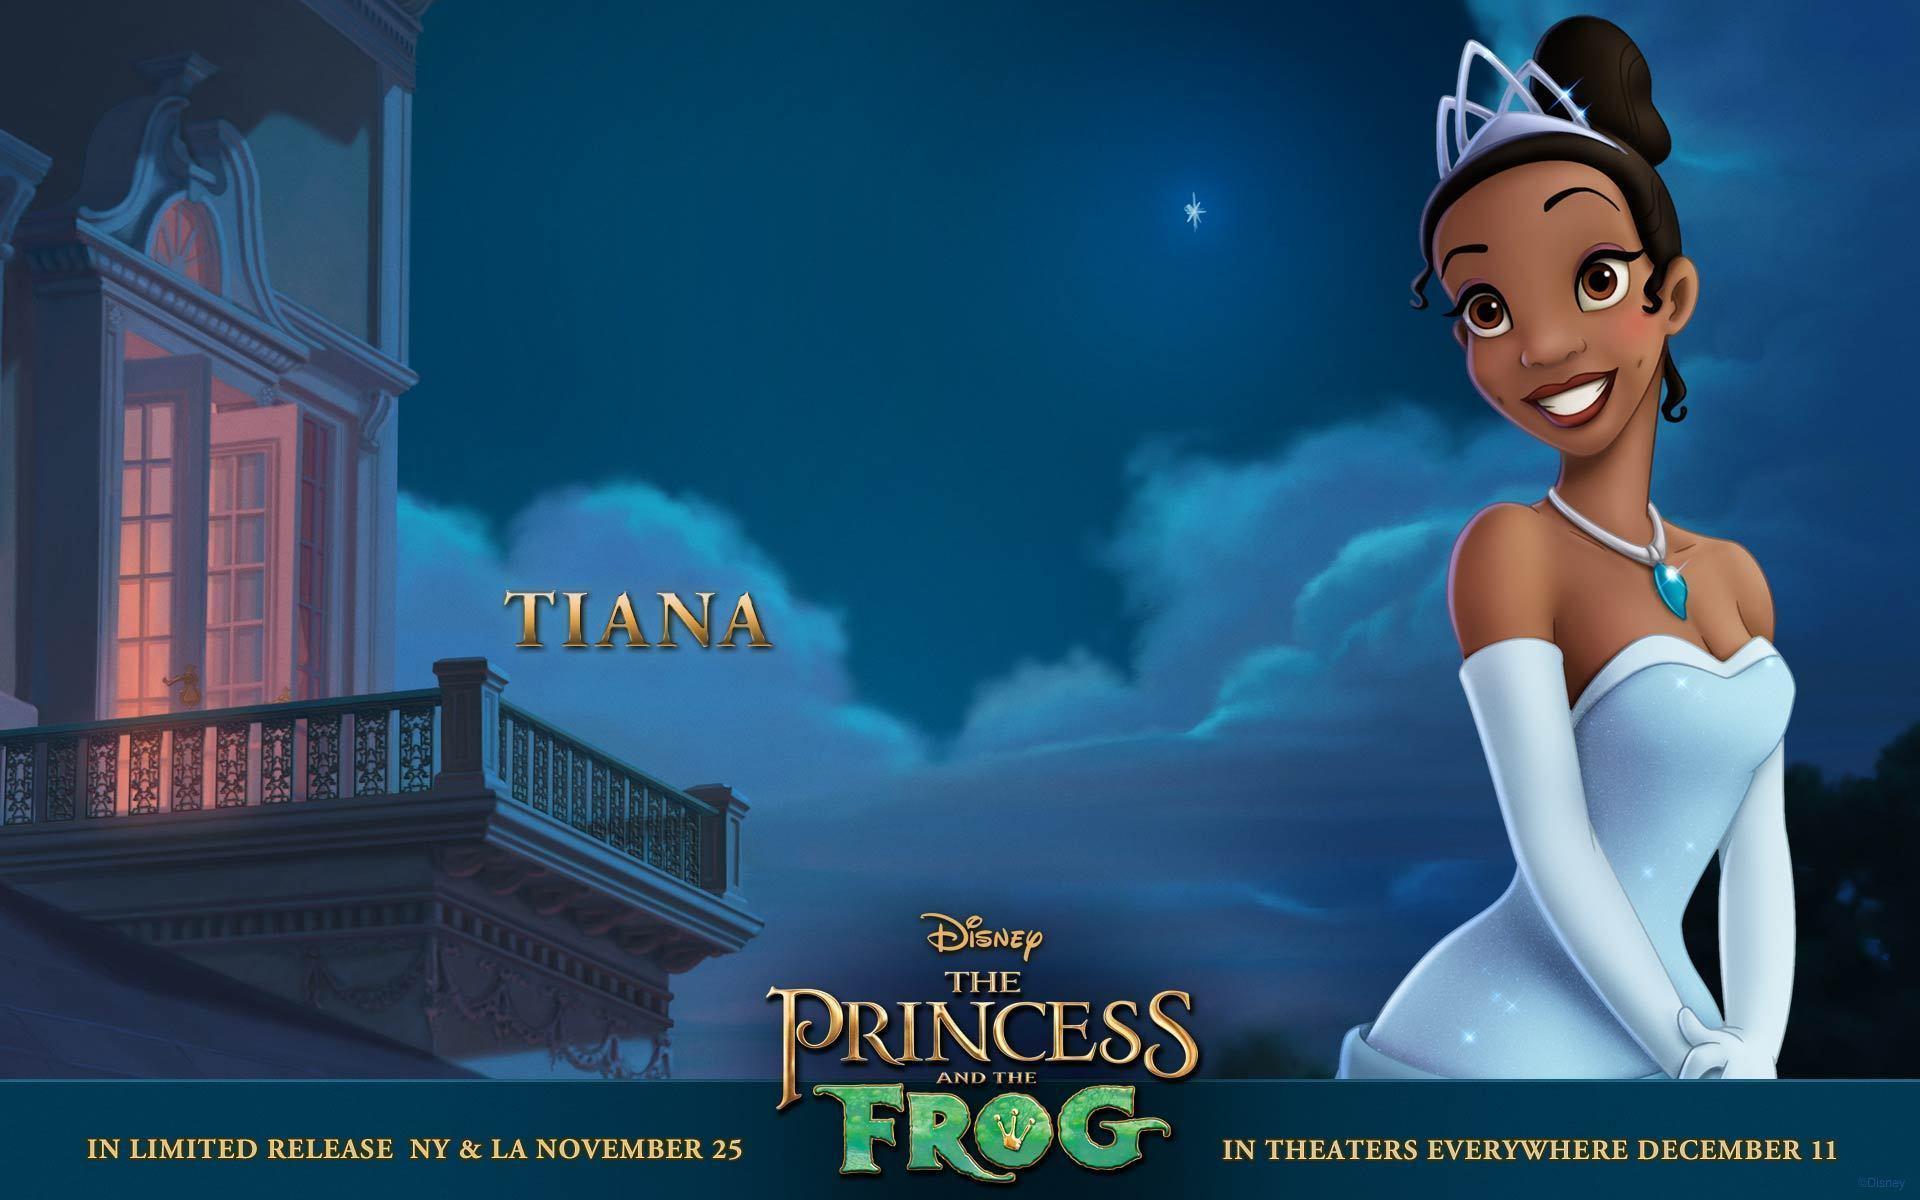 News And Entertainment Princess Tiana Jan 04 2013 21 23 10 News And Entertainment Princess